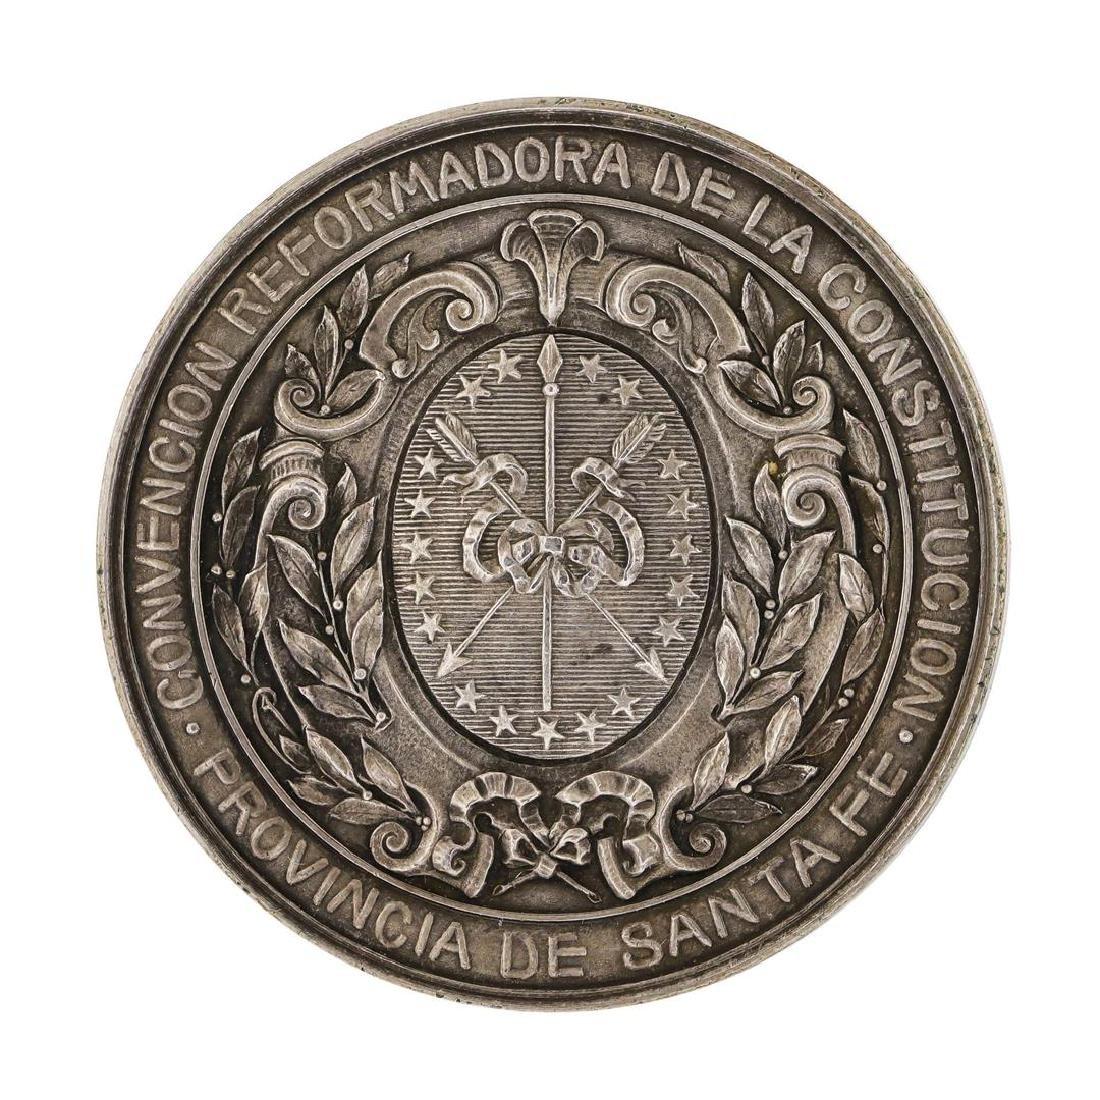 1907 Argentina Santa Fe Province Silver 4 oz Medal